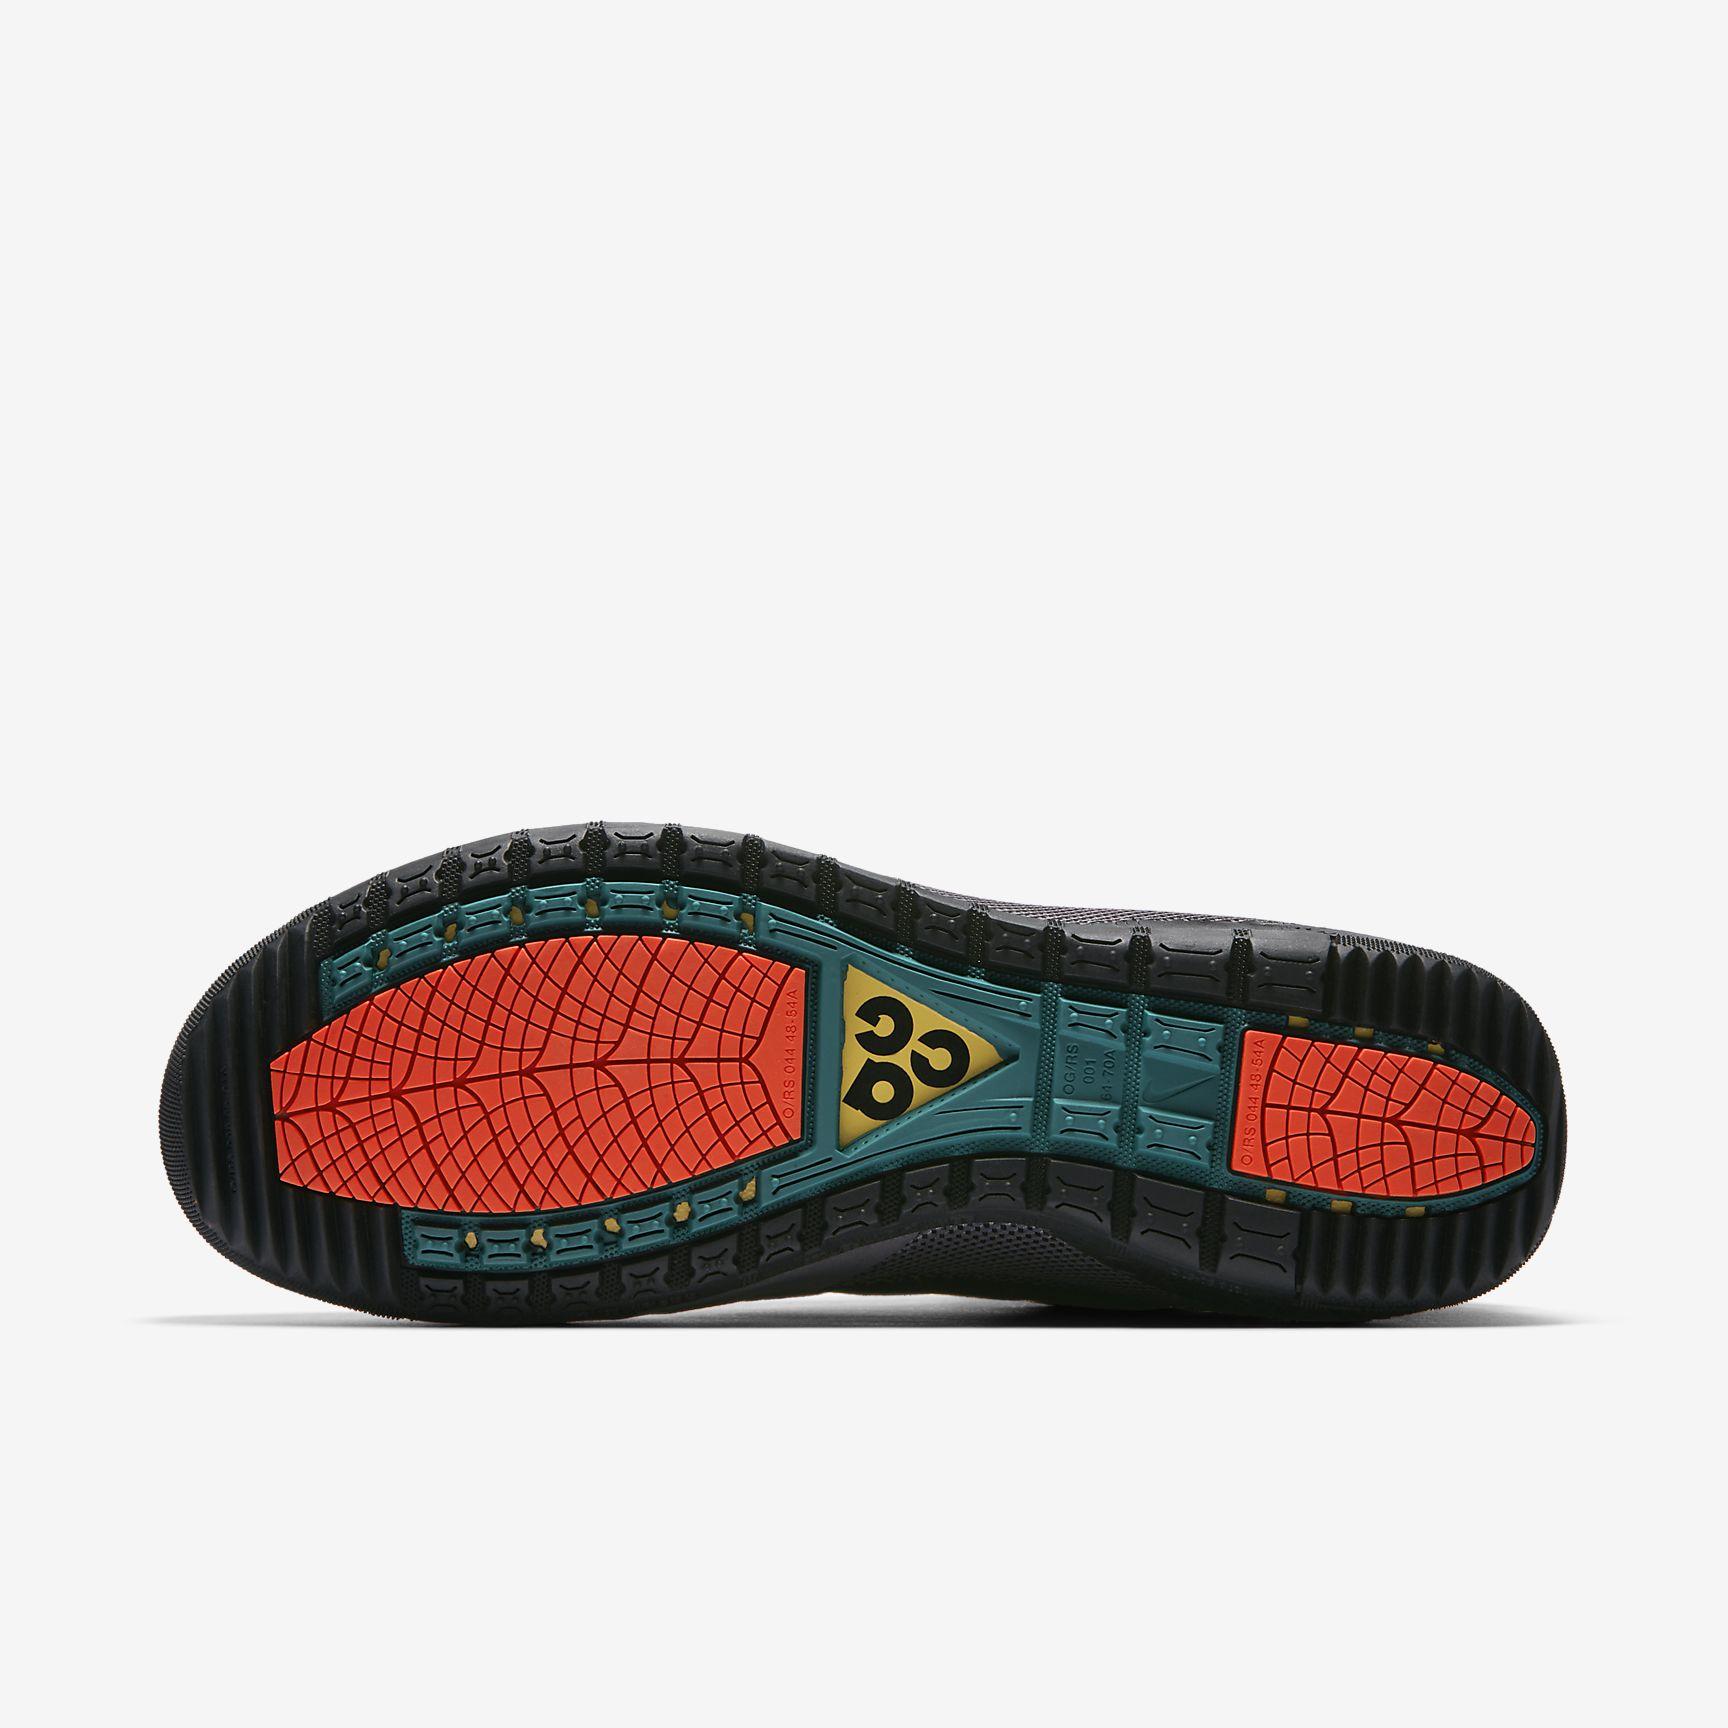 acg-ruckel-ridge-shoe-1dh4SH1